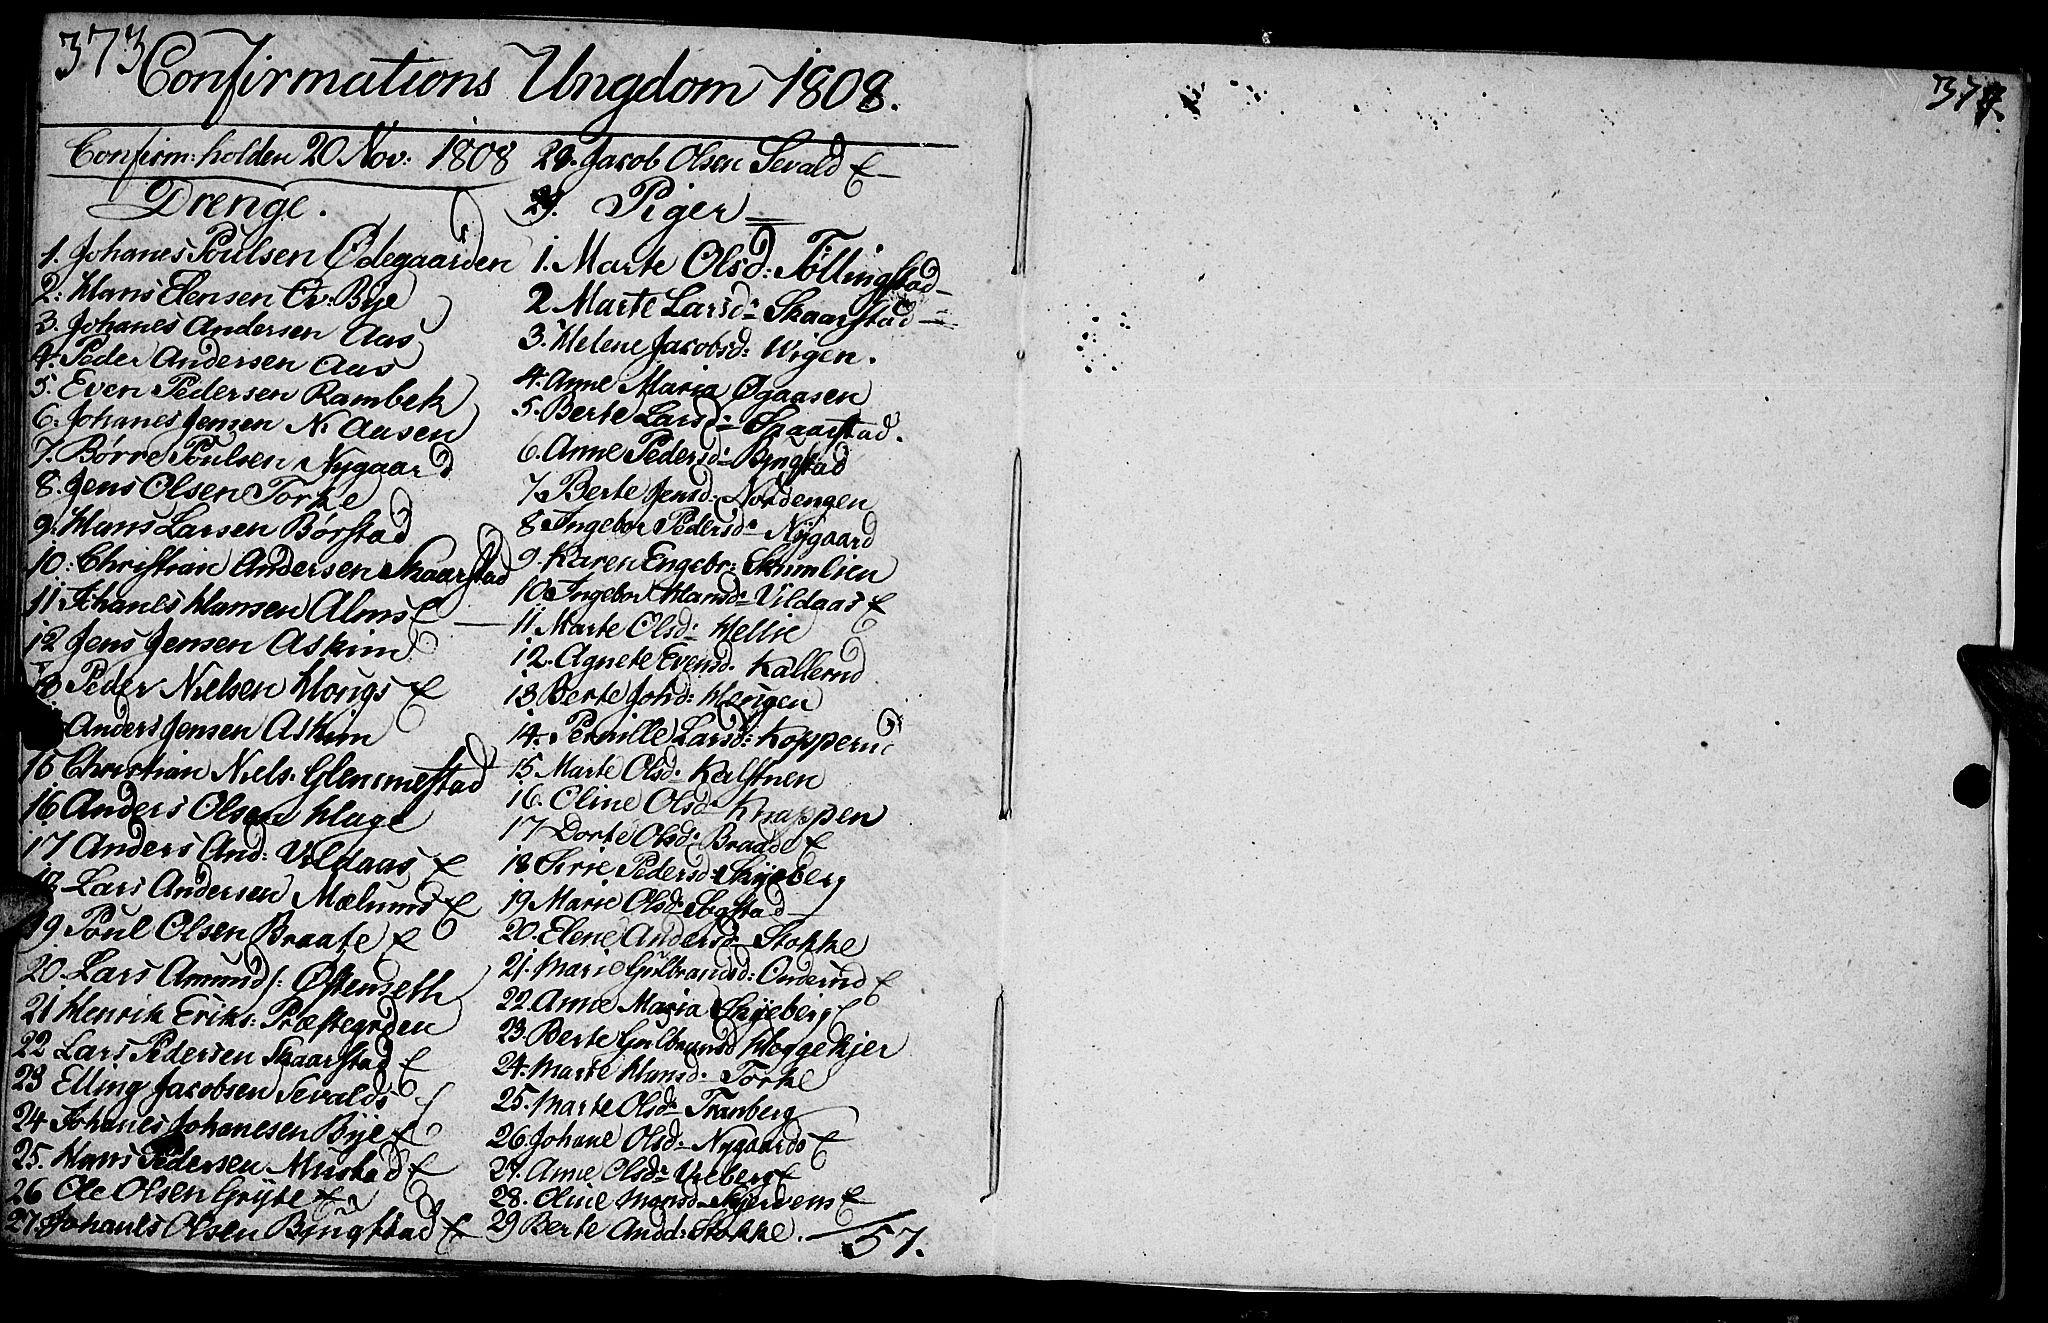 SAH, Vardal prestekontor, H/Ha/Hab/L0003: Klokkerbok nr. 3, 1803-1808, s. 373-374